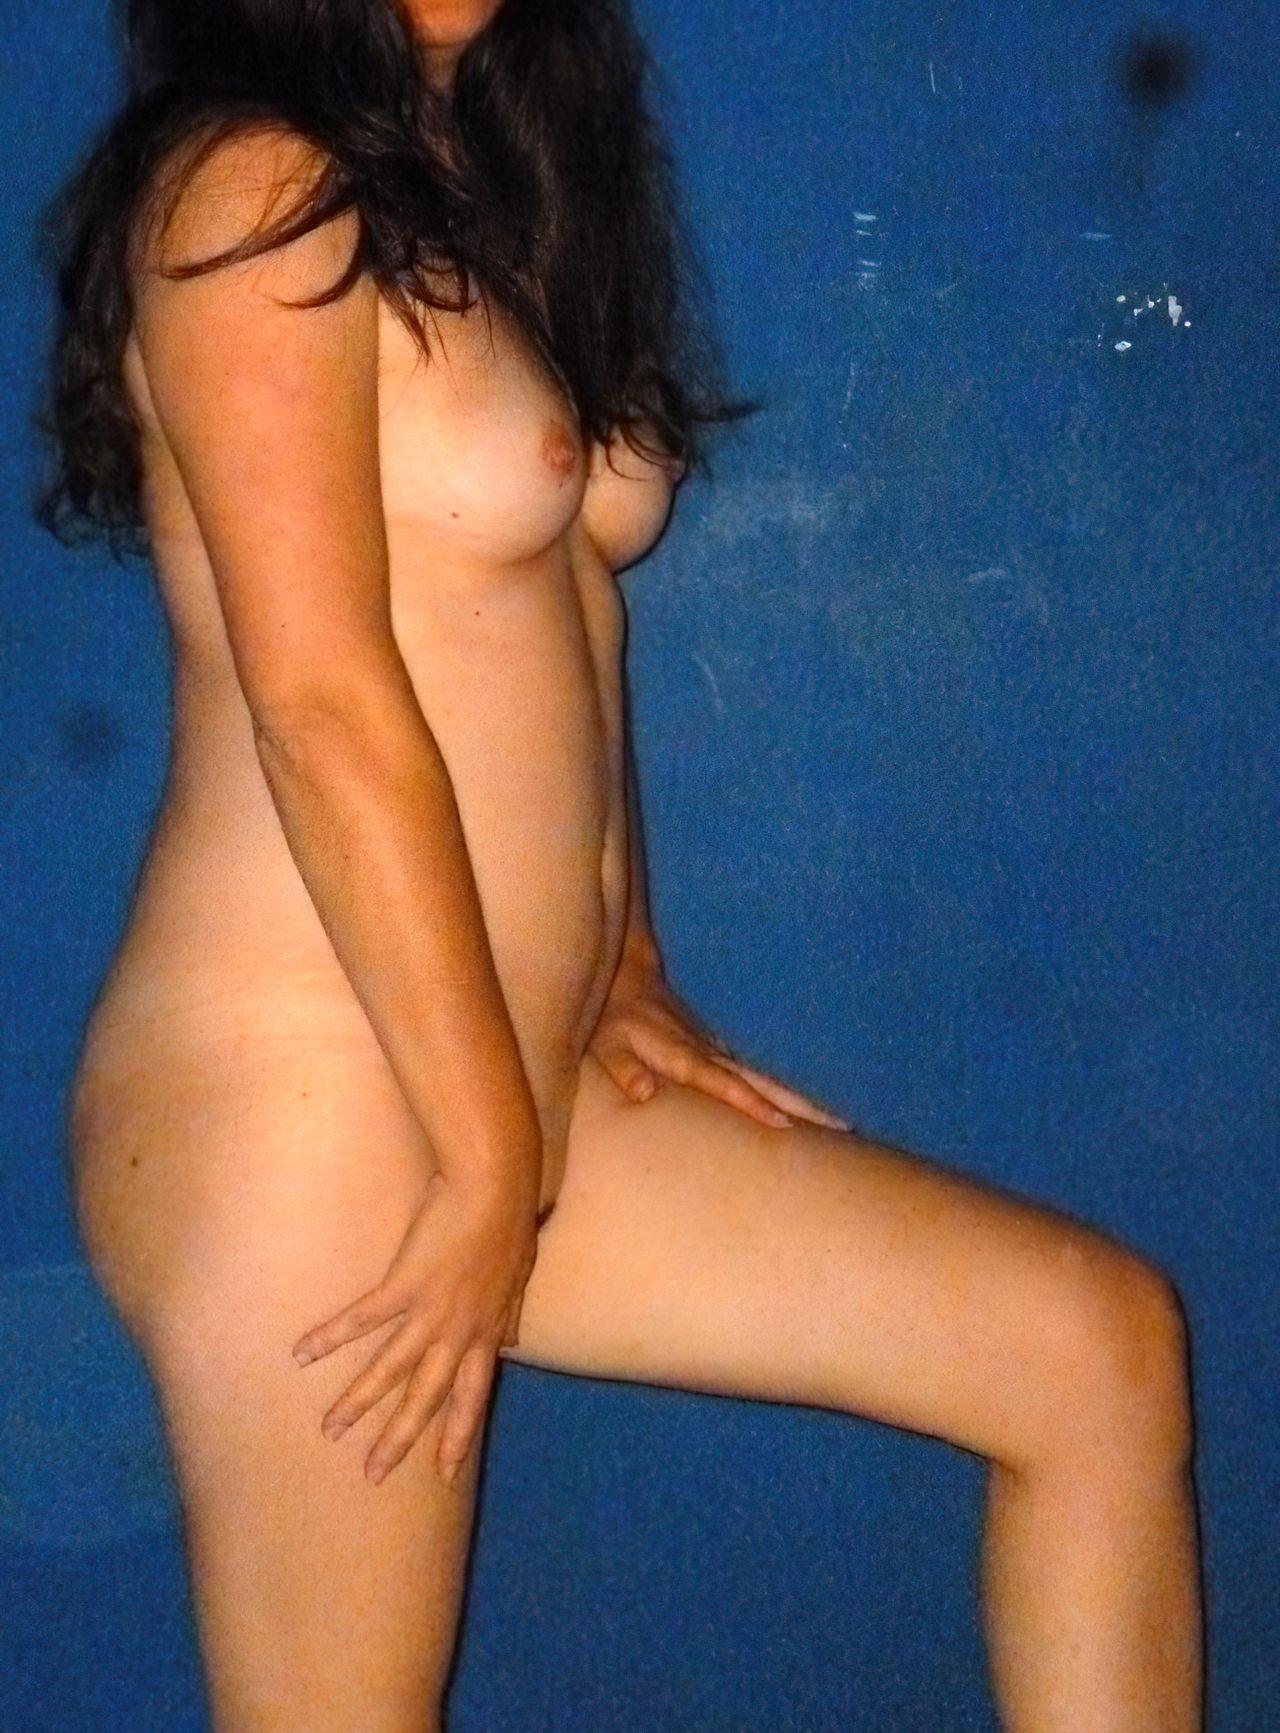 Mulher Exibindo Corpo (5)